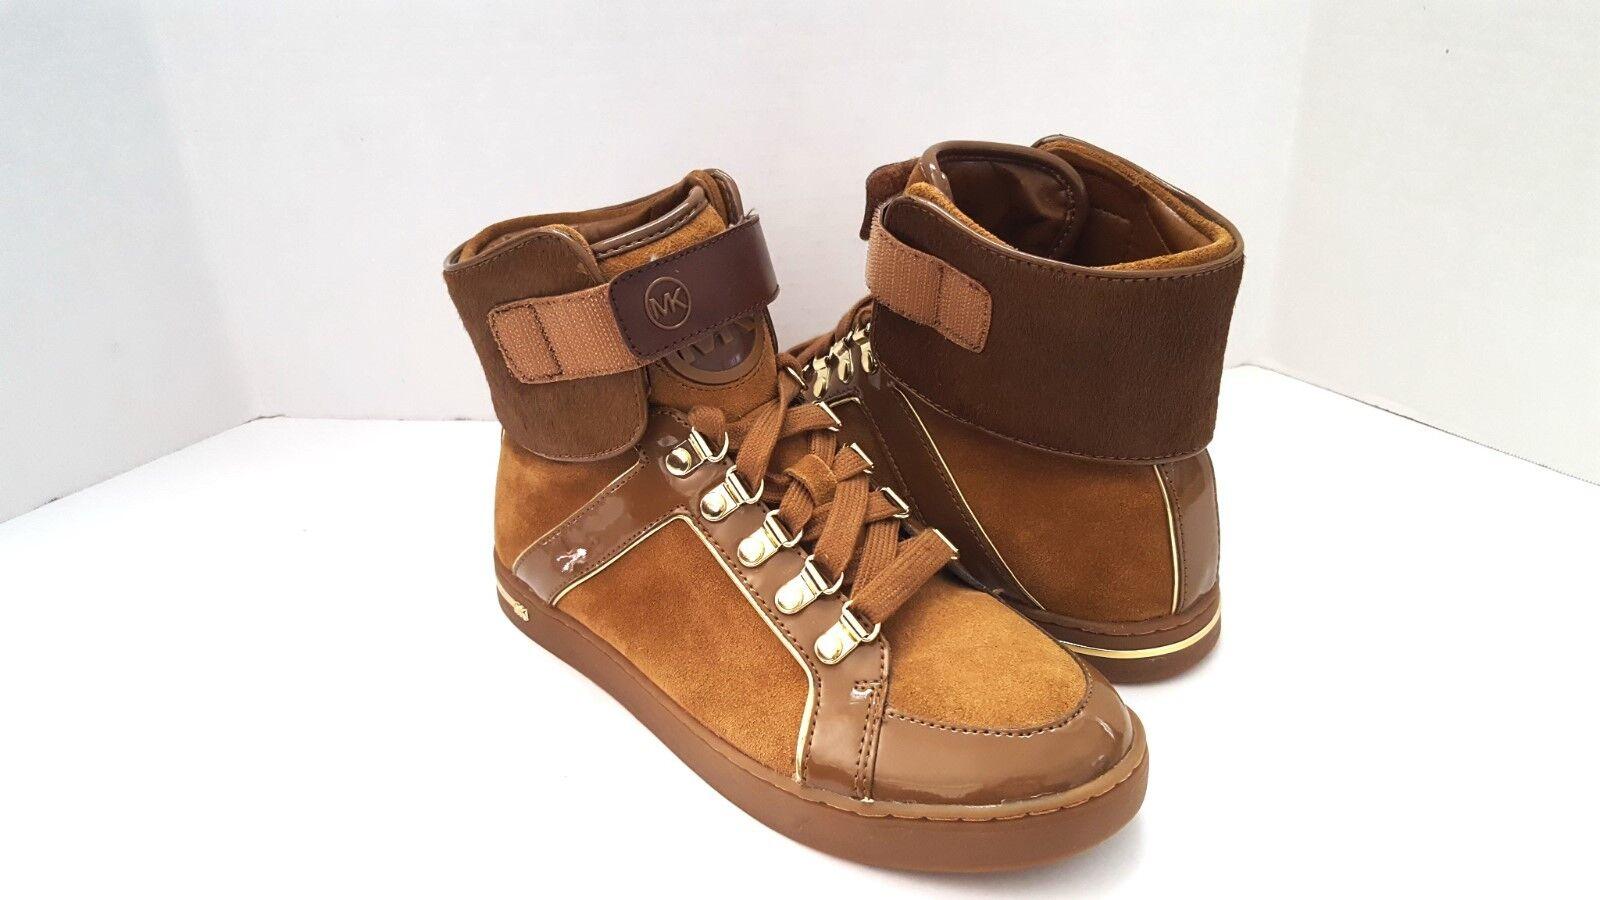 New Michael Kors Greenwich High Top Fashion Sneakers  Brown Sz 7